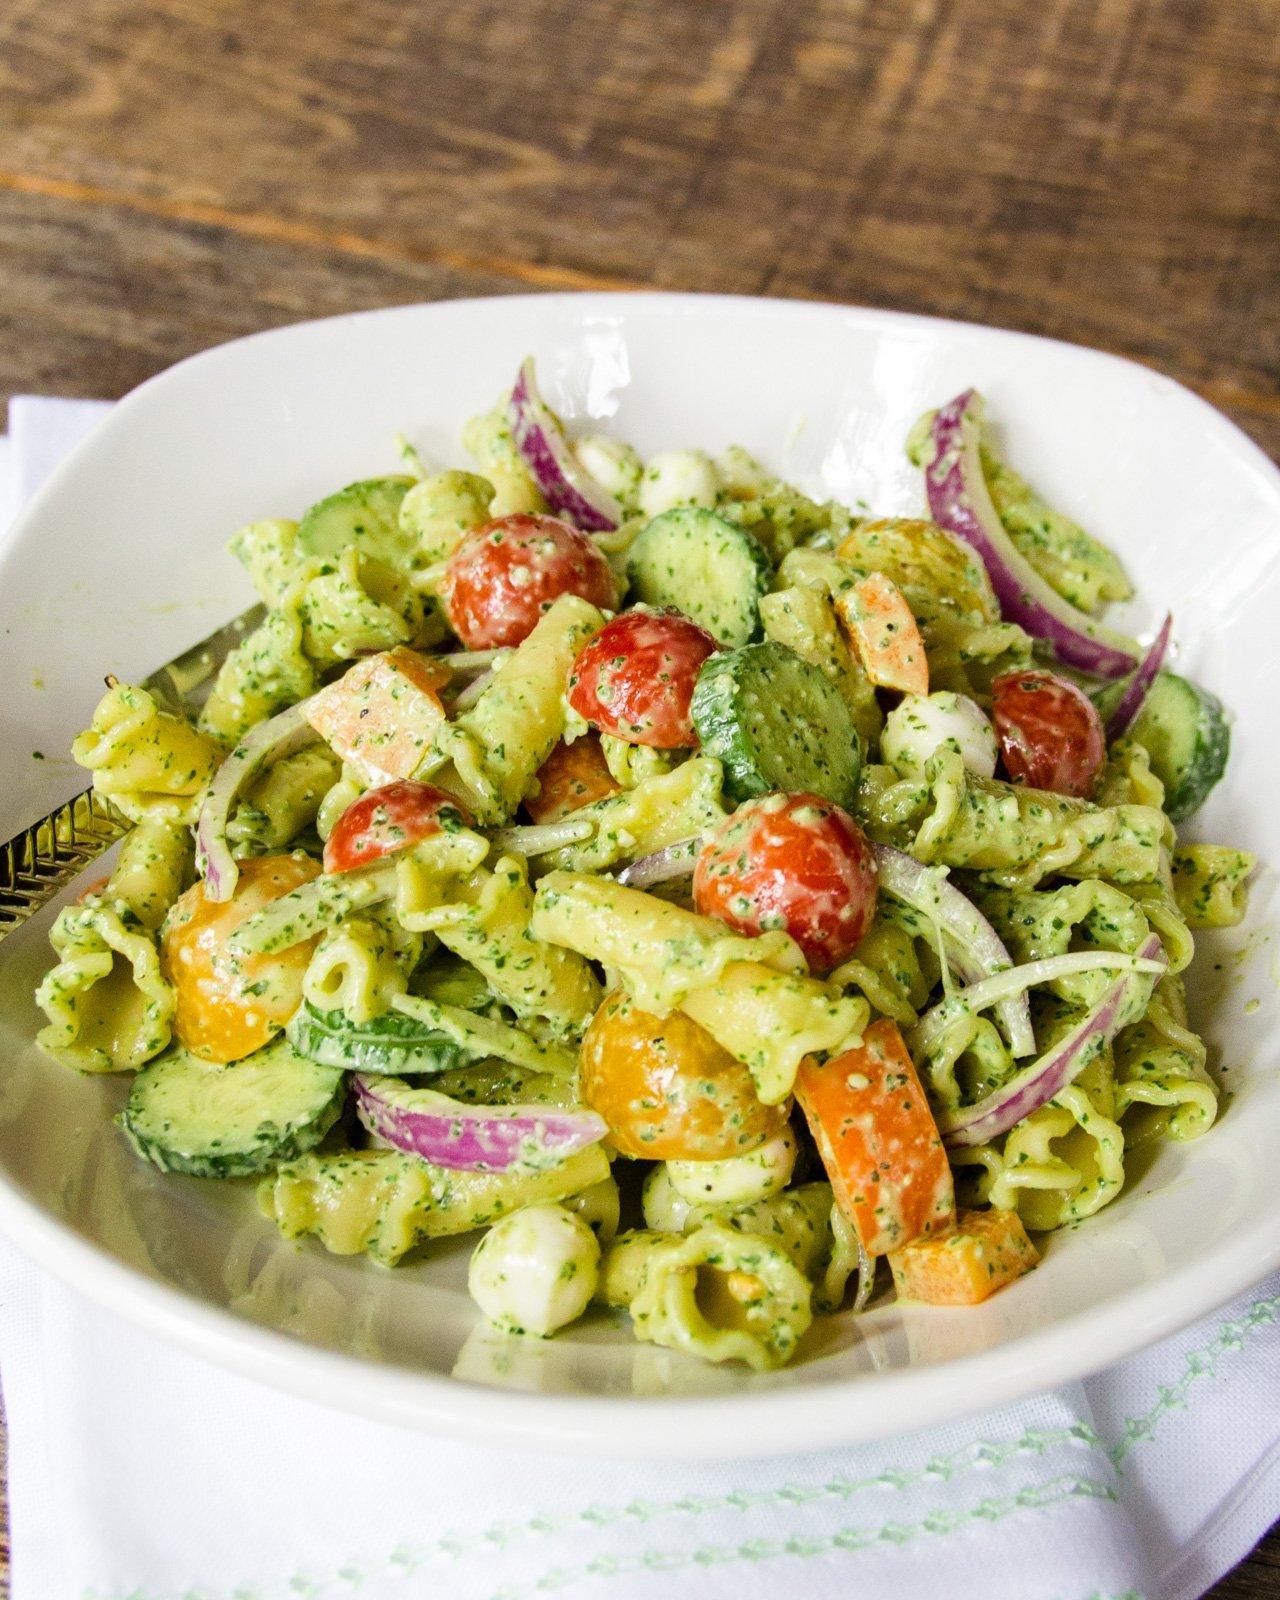 Creamy Pesto Pasta Salad | Blue Jean Chef - Meredith Laurence